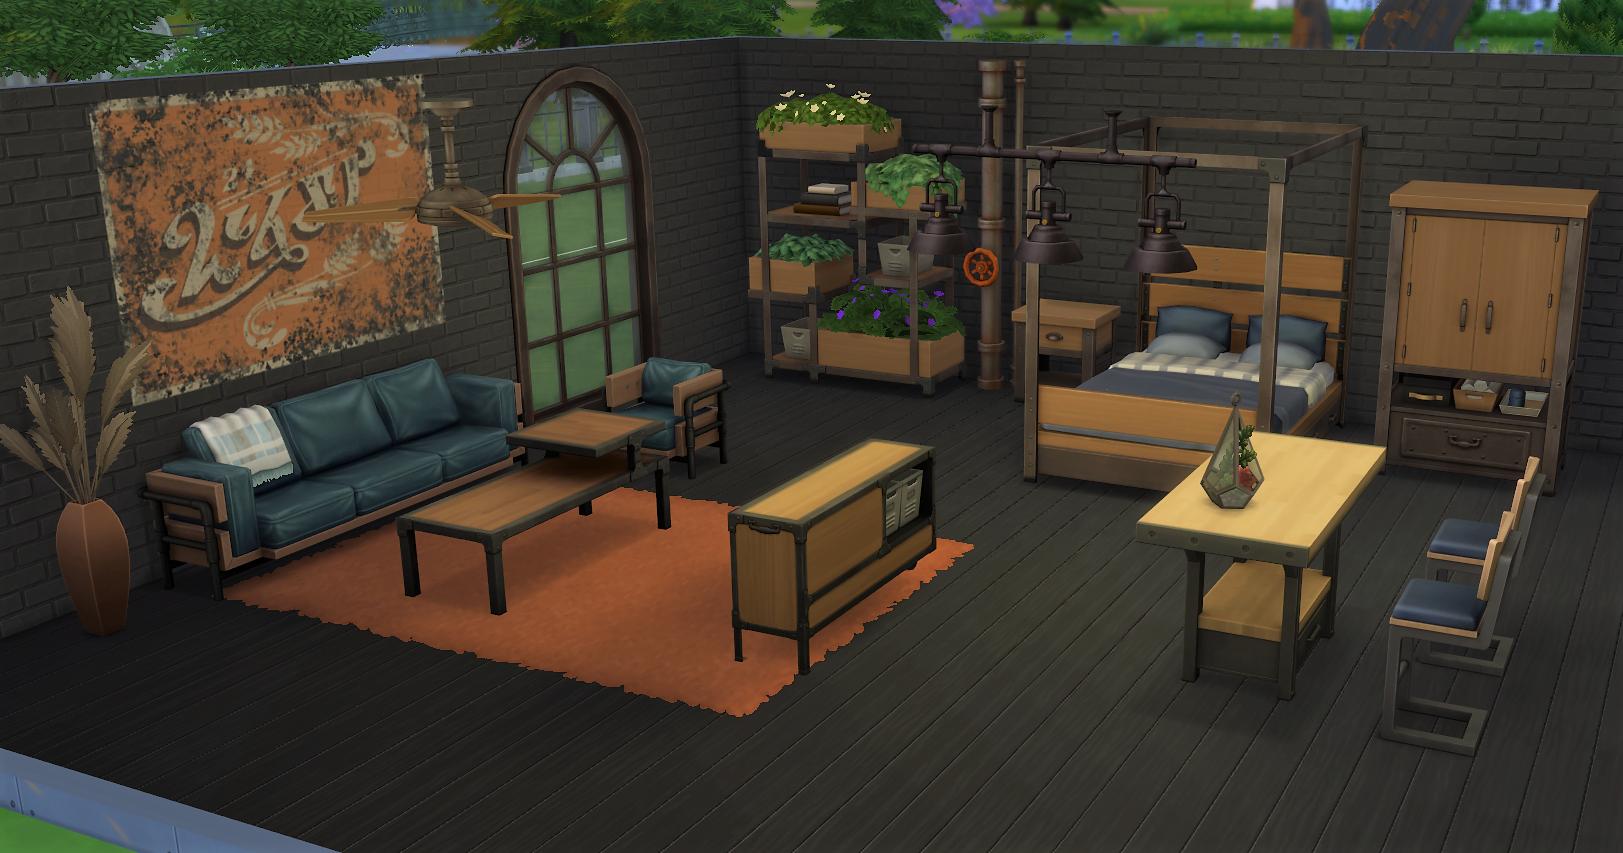 Sims 4 Industrial Loft Kit (2)